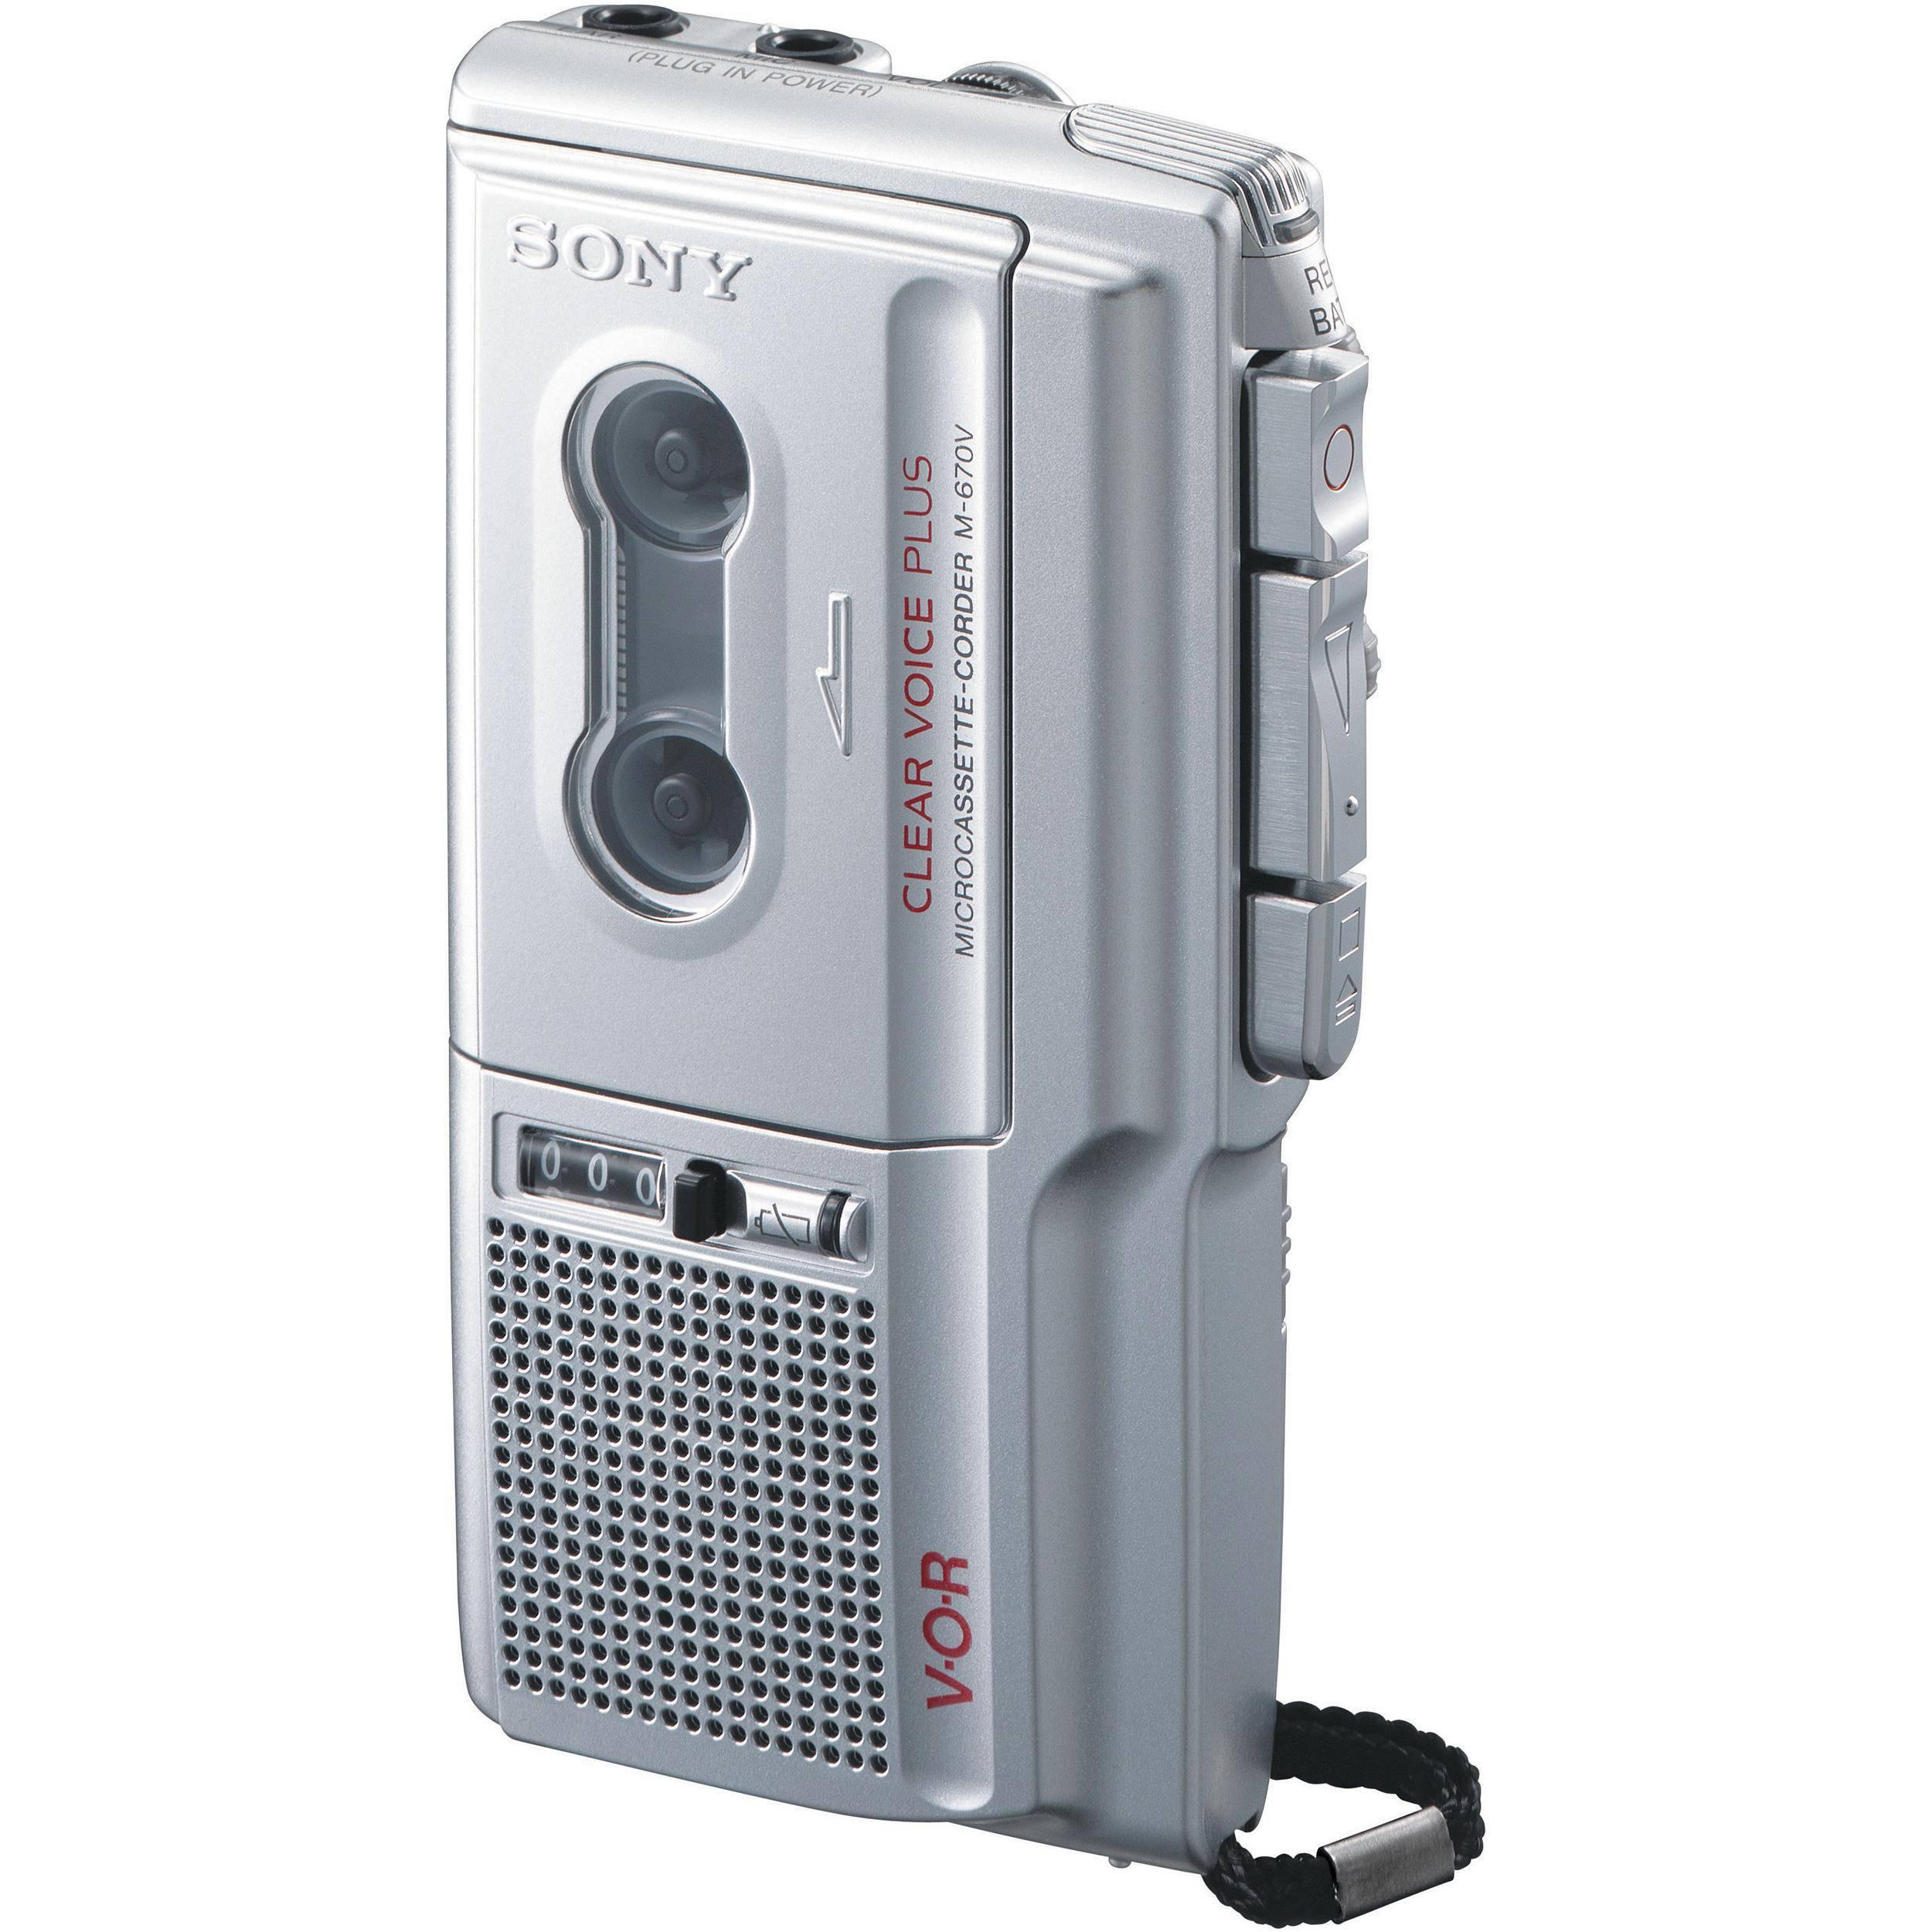 Sony M-670V Microcassette Voice Recorder M670V B&H Photo Video